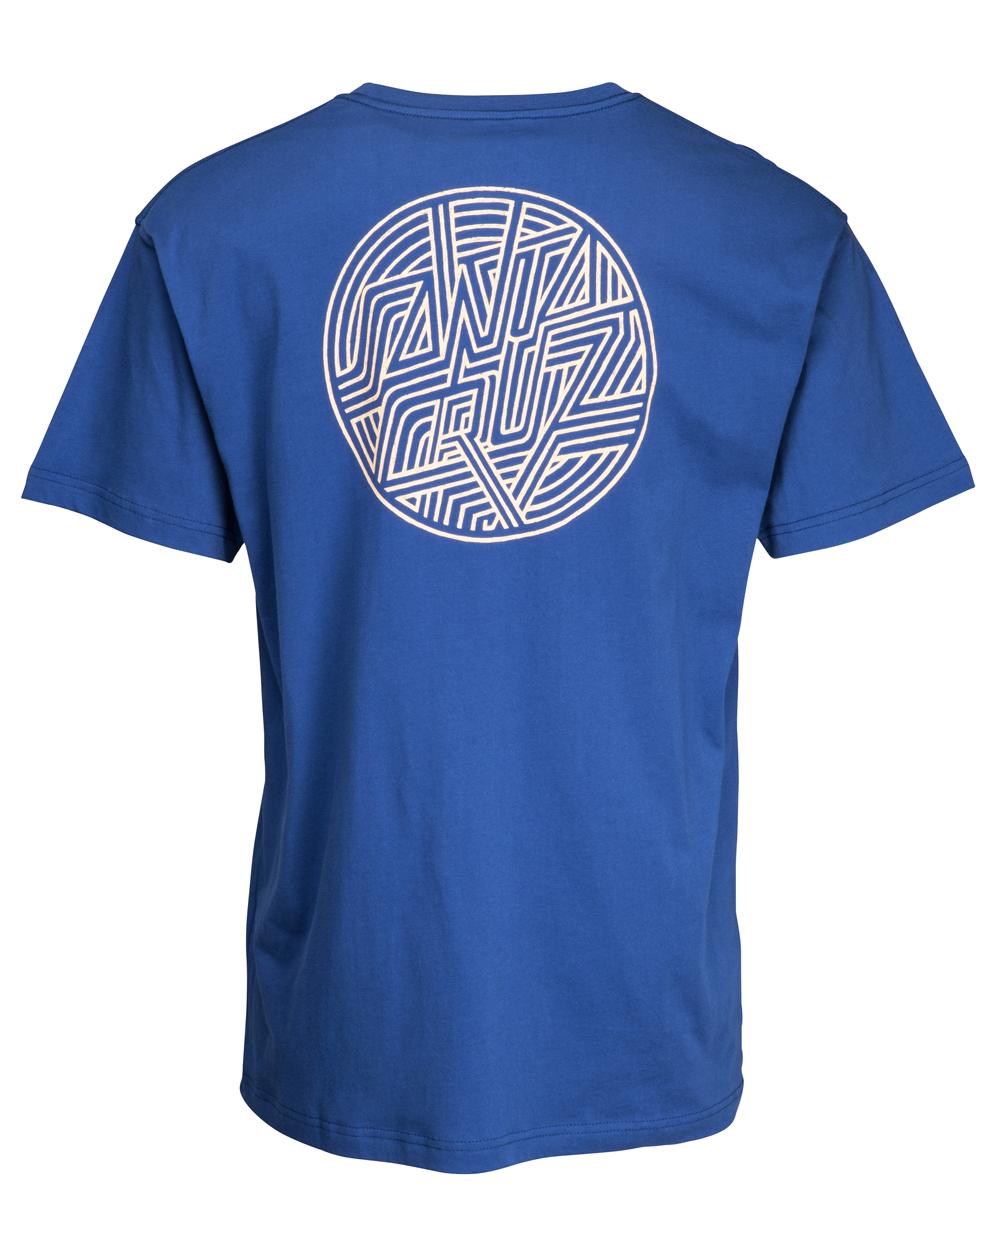 Santa Cruz Herren T-Shirt Dimension Dot Navy